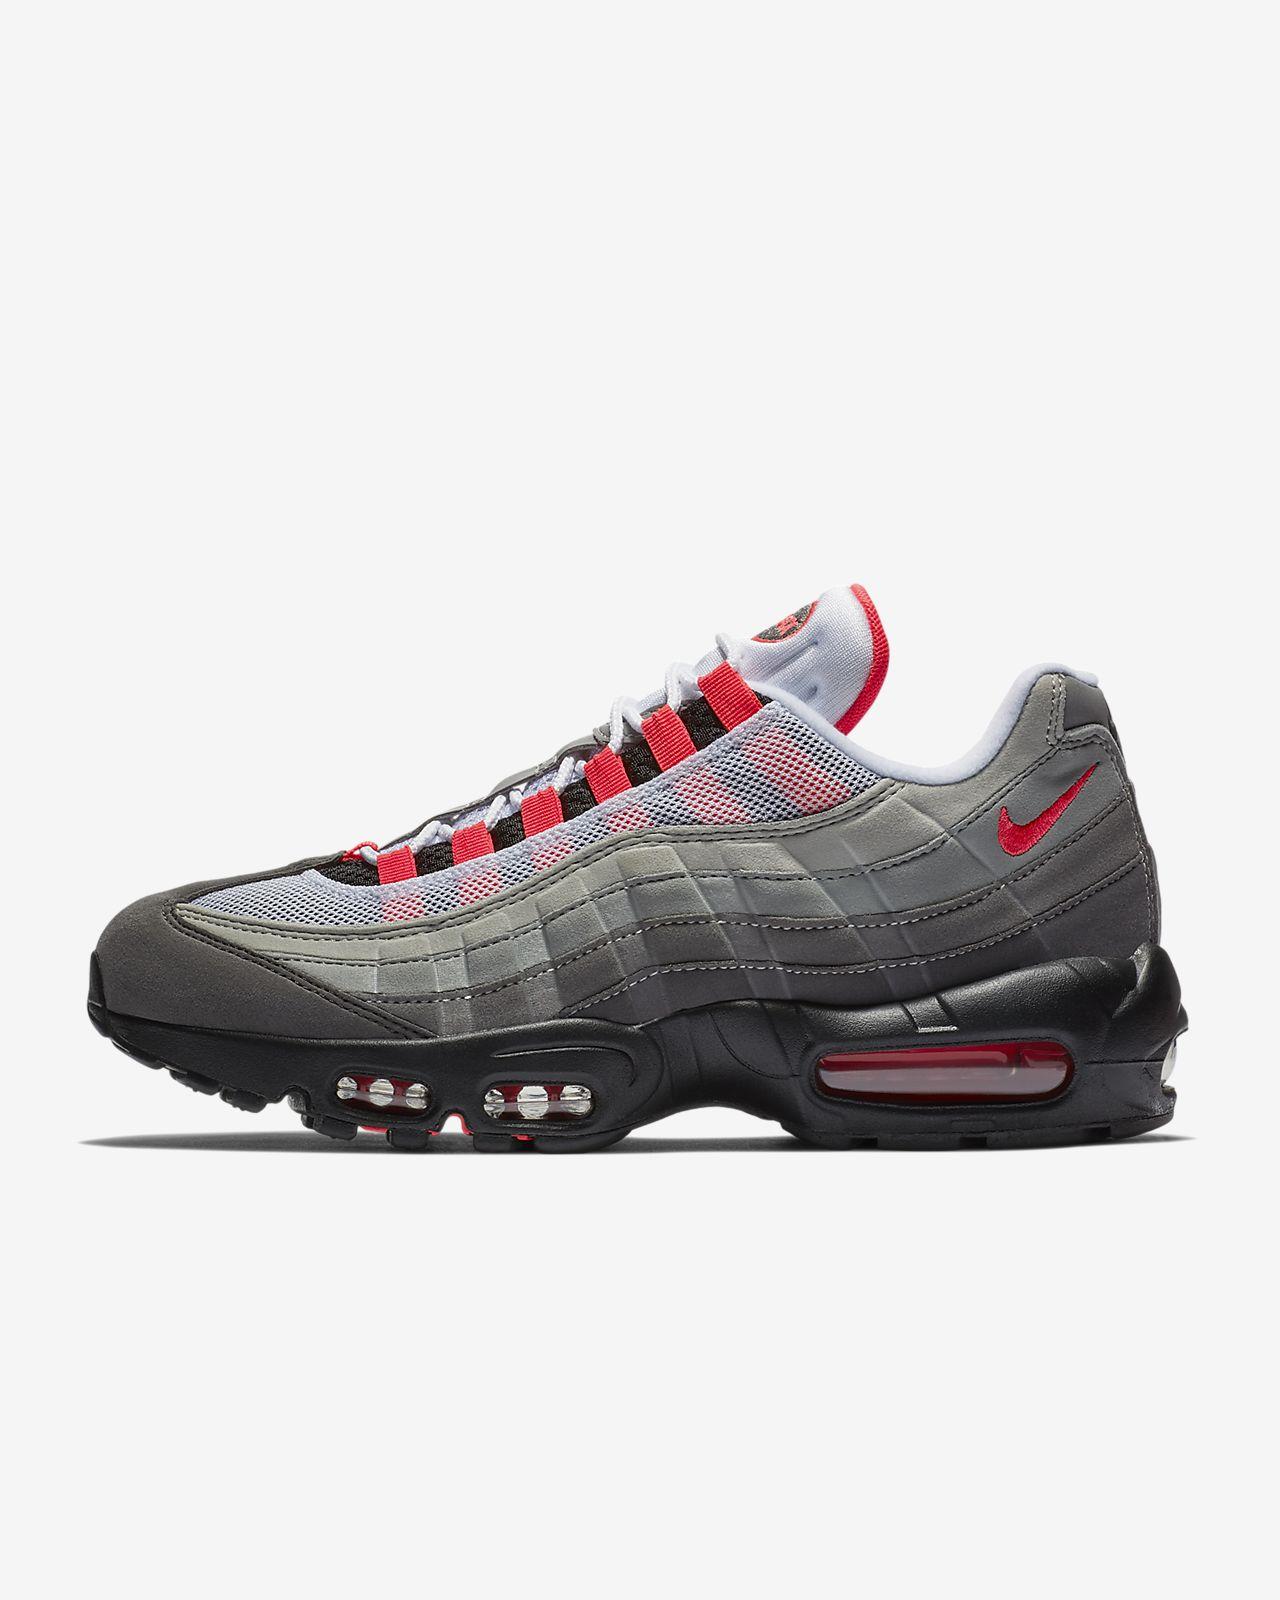 Nike Air Max 95 OG Shoe